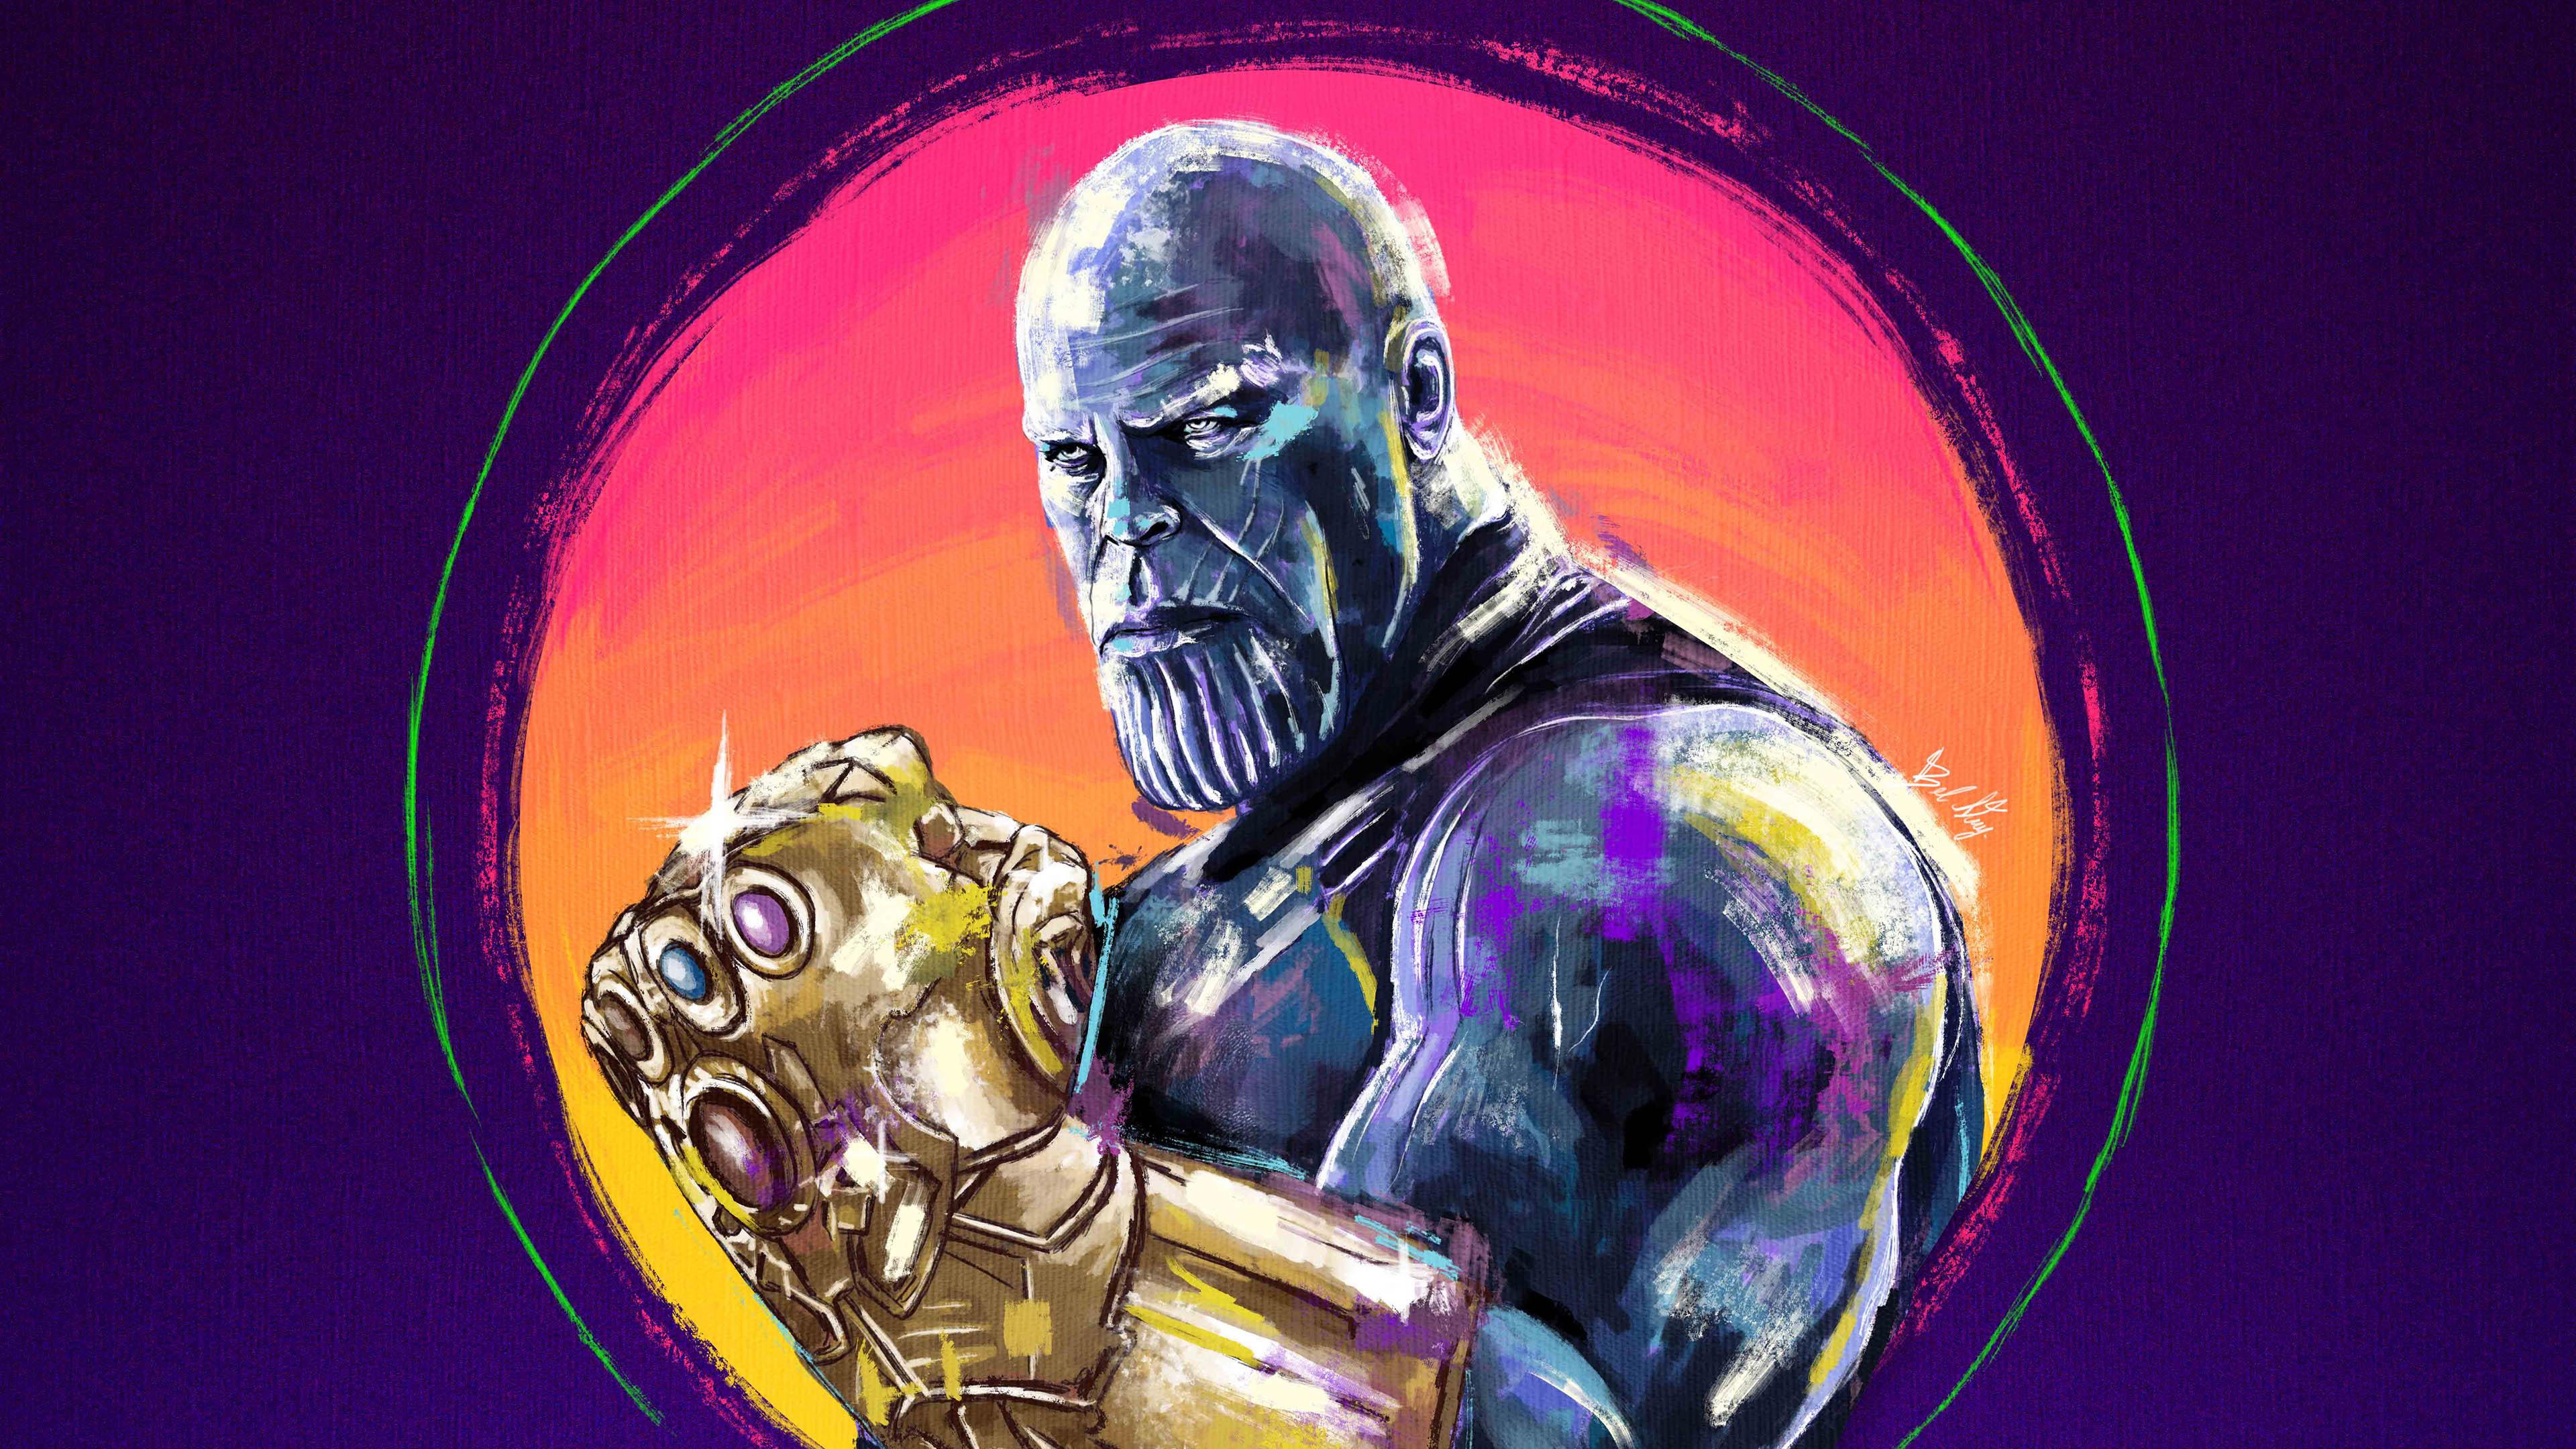 thanos sketch artwork 1563220407 - Thanos Sketch Artwork - thanos-wallpapers, supervillain wallpapers, superheroes wallpapers, hd-wallpapers, digital art wallpapers, artwork wallpapers, 4k-wallpapers